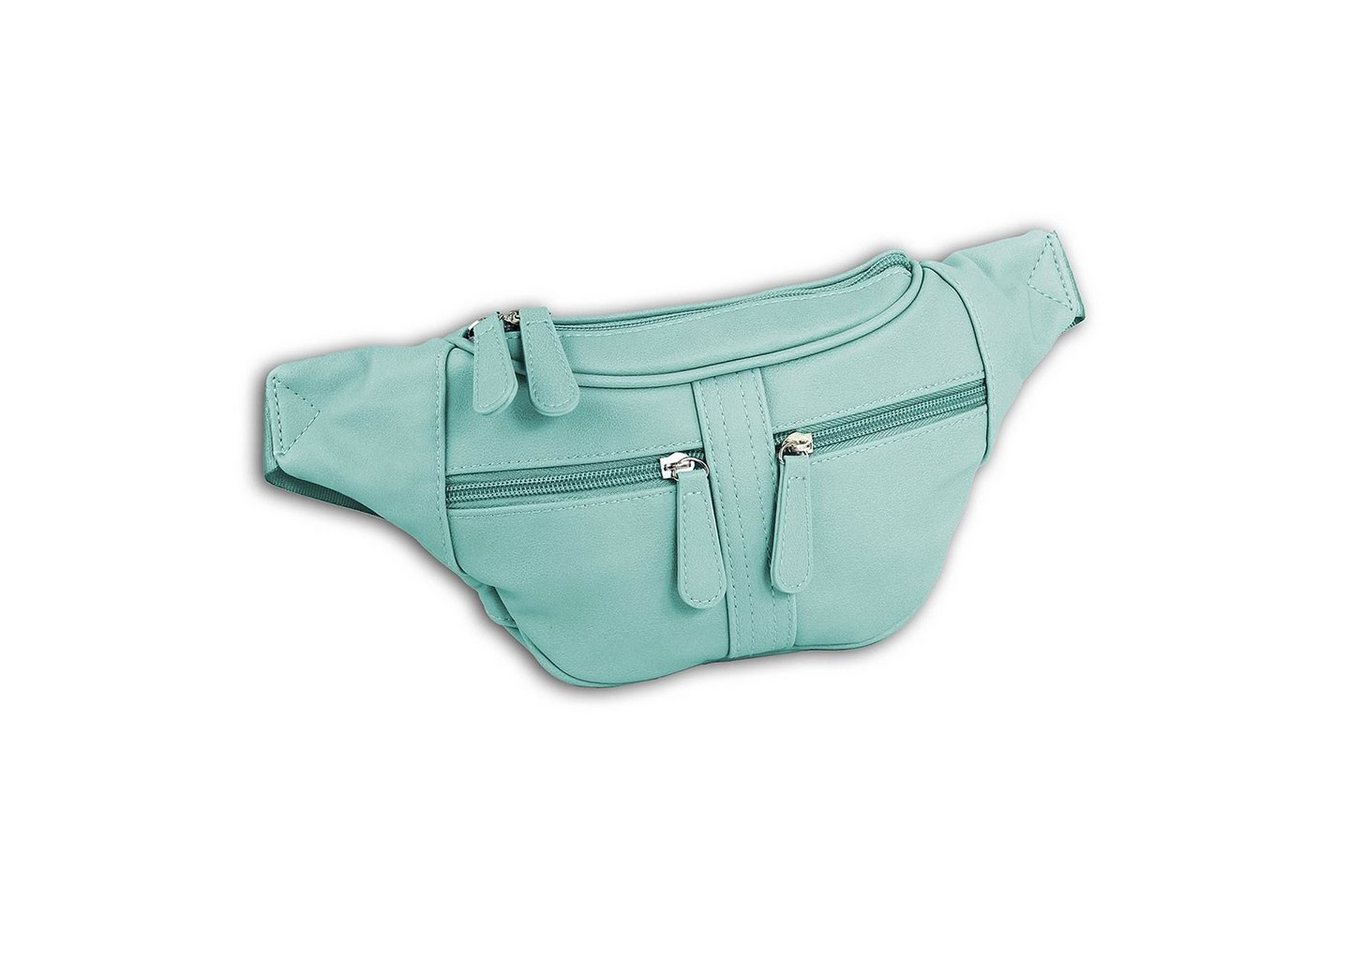 new bags -  Gürteltasche »OTD5023X  Damen Hüfttasche Gürteltasche« (Gürteltasche), Damen, Jugend Tasche mint, ca. 35cm x ca. 5cm